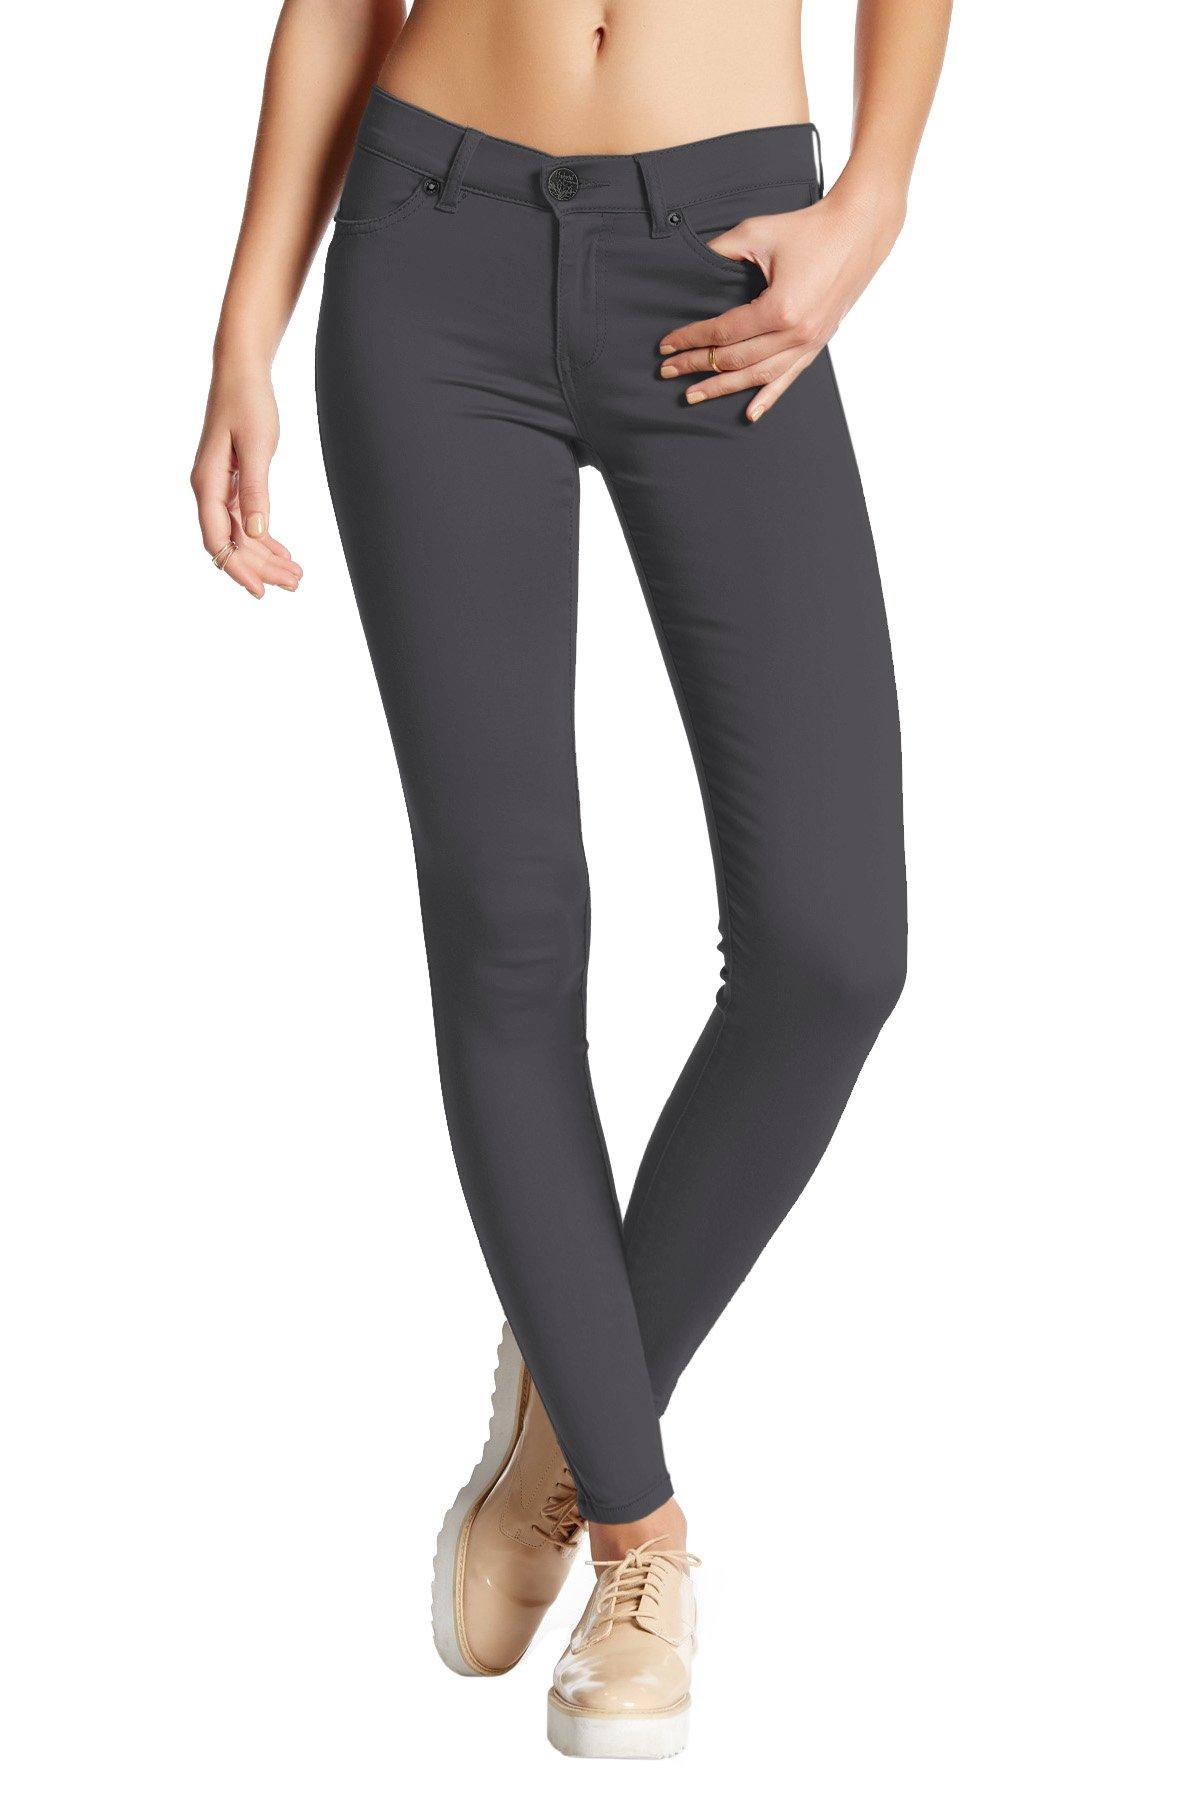 HyBrid & Company Womens Super Stretch Comfy Skinny Pants P44876SK Charcoal S